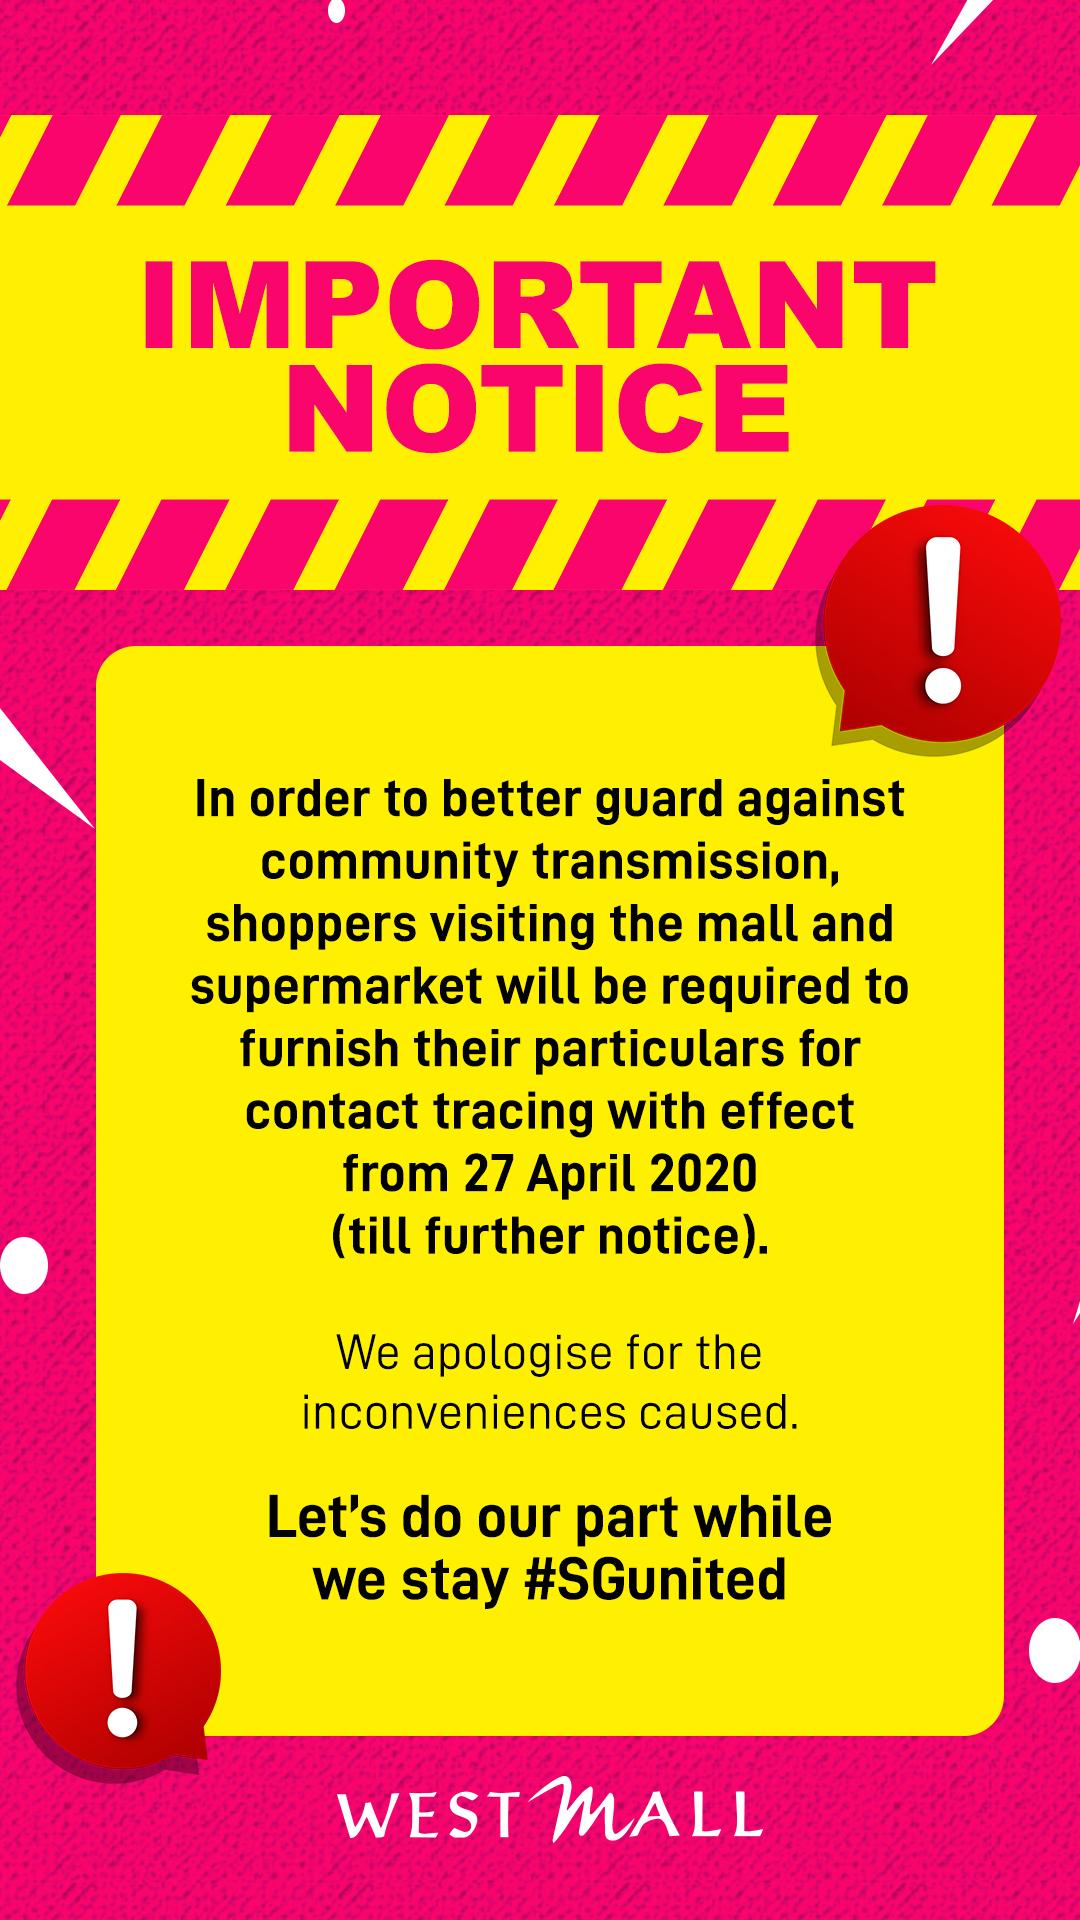 Important notice B